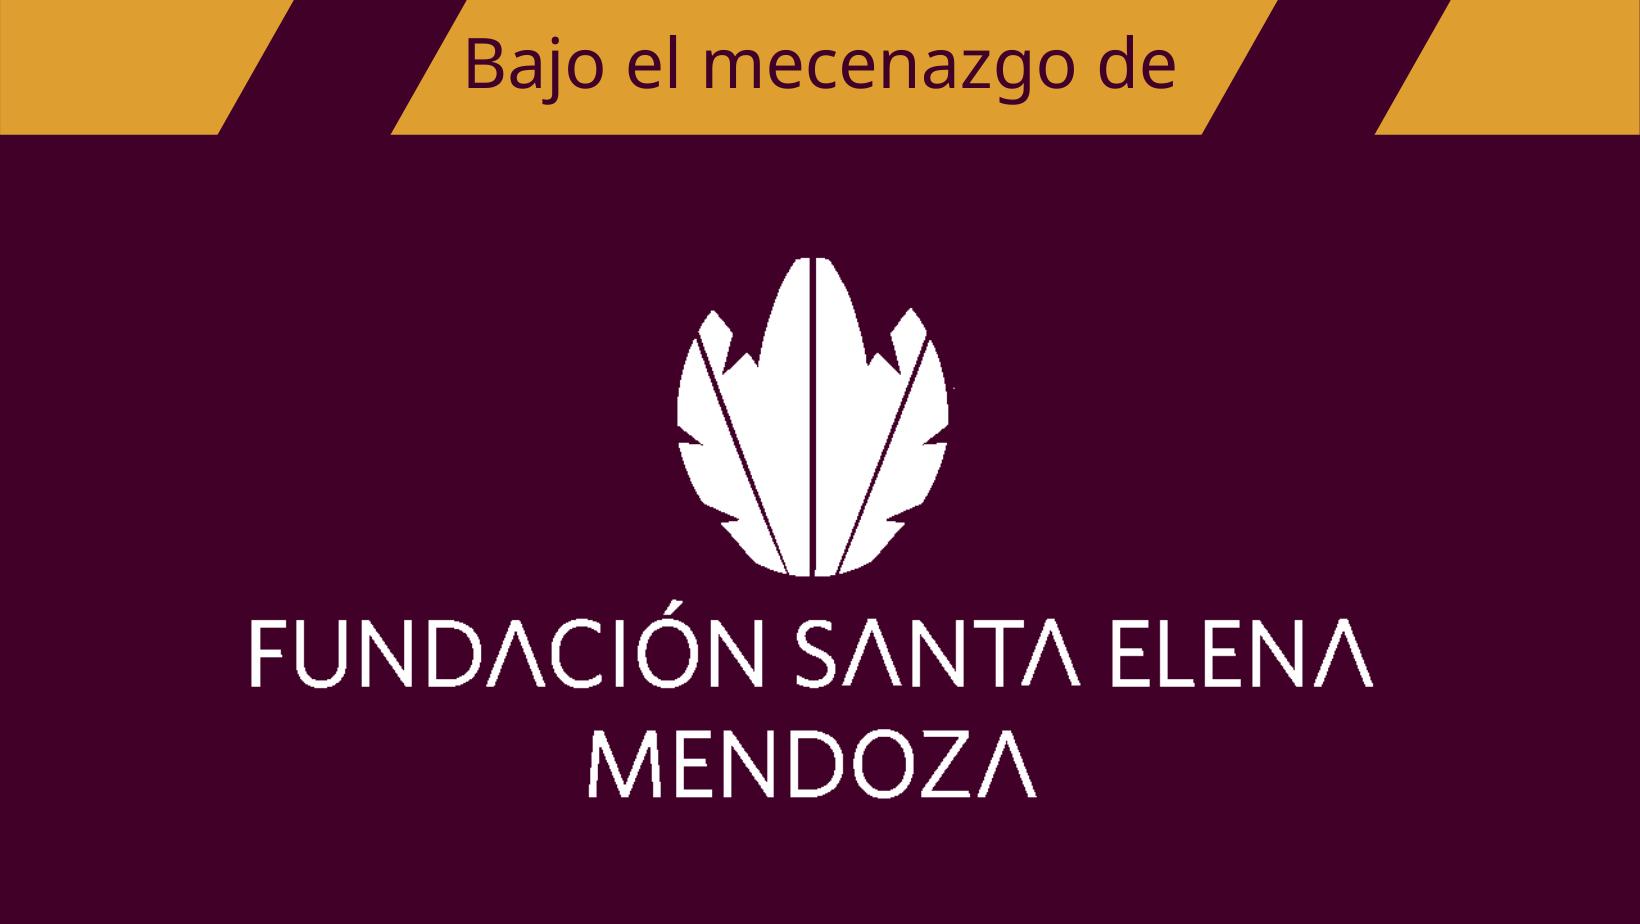 Fundacion Santa Elena